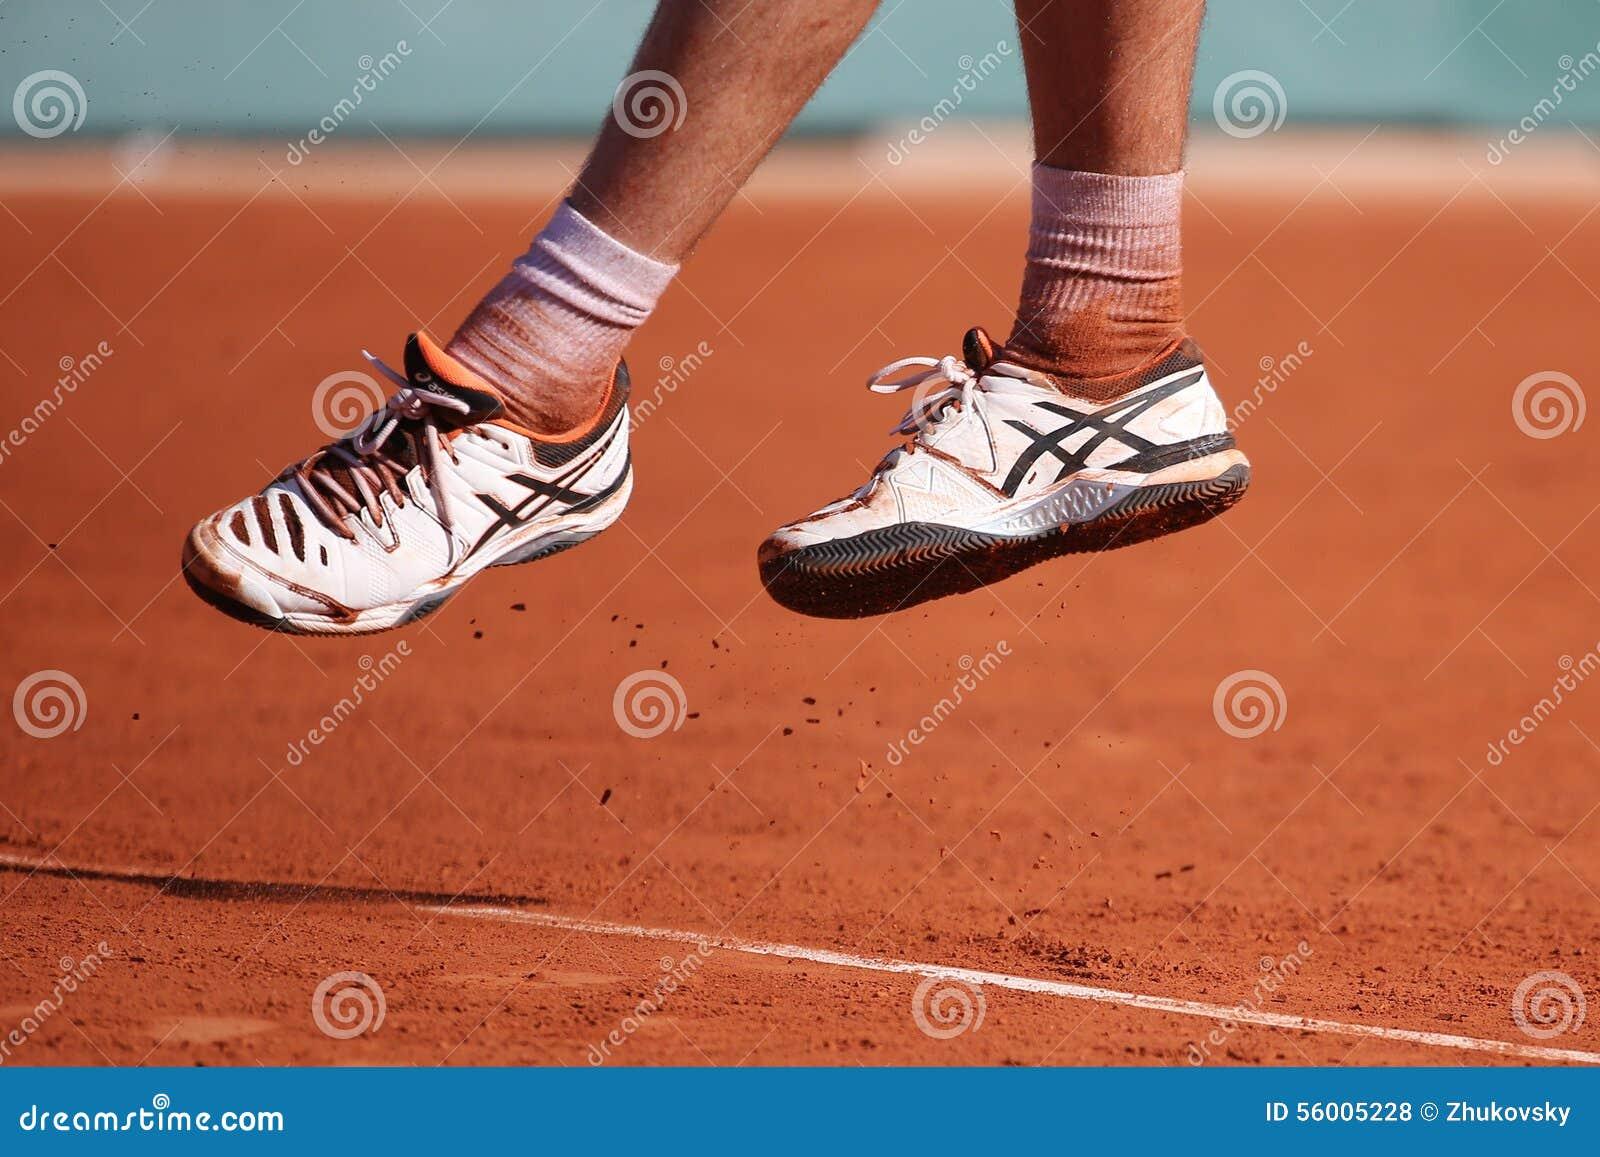 Gasquet Tennis Shoes